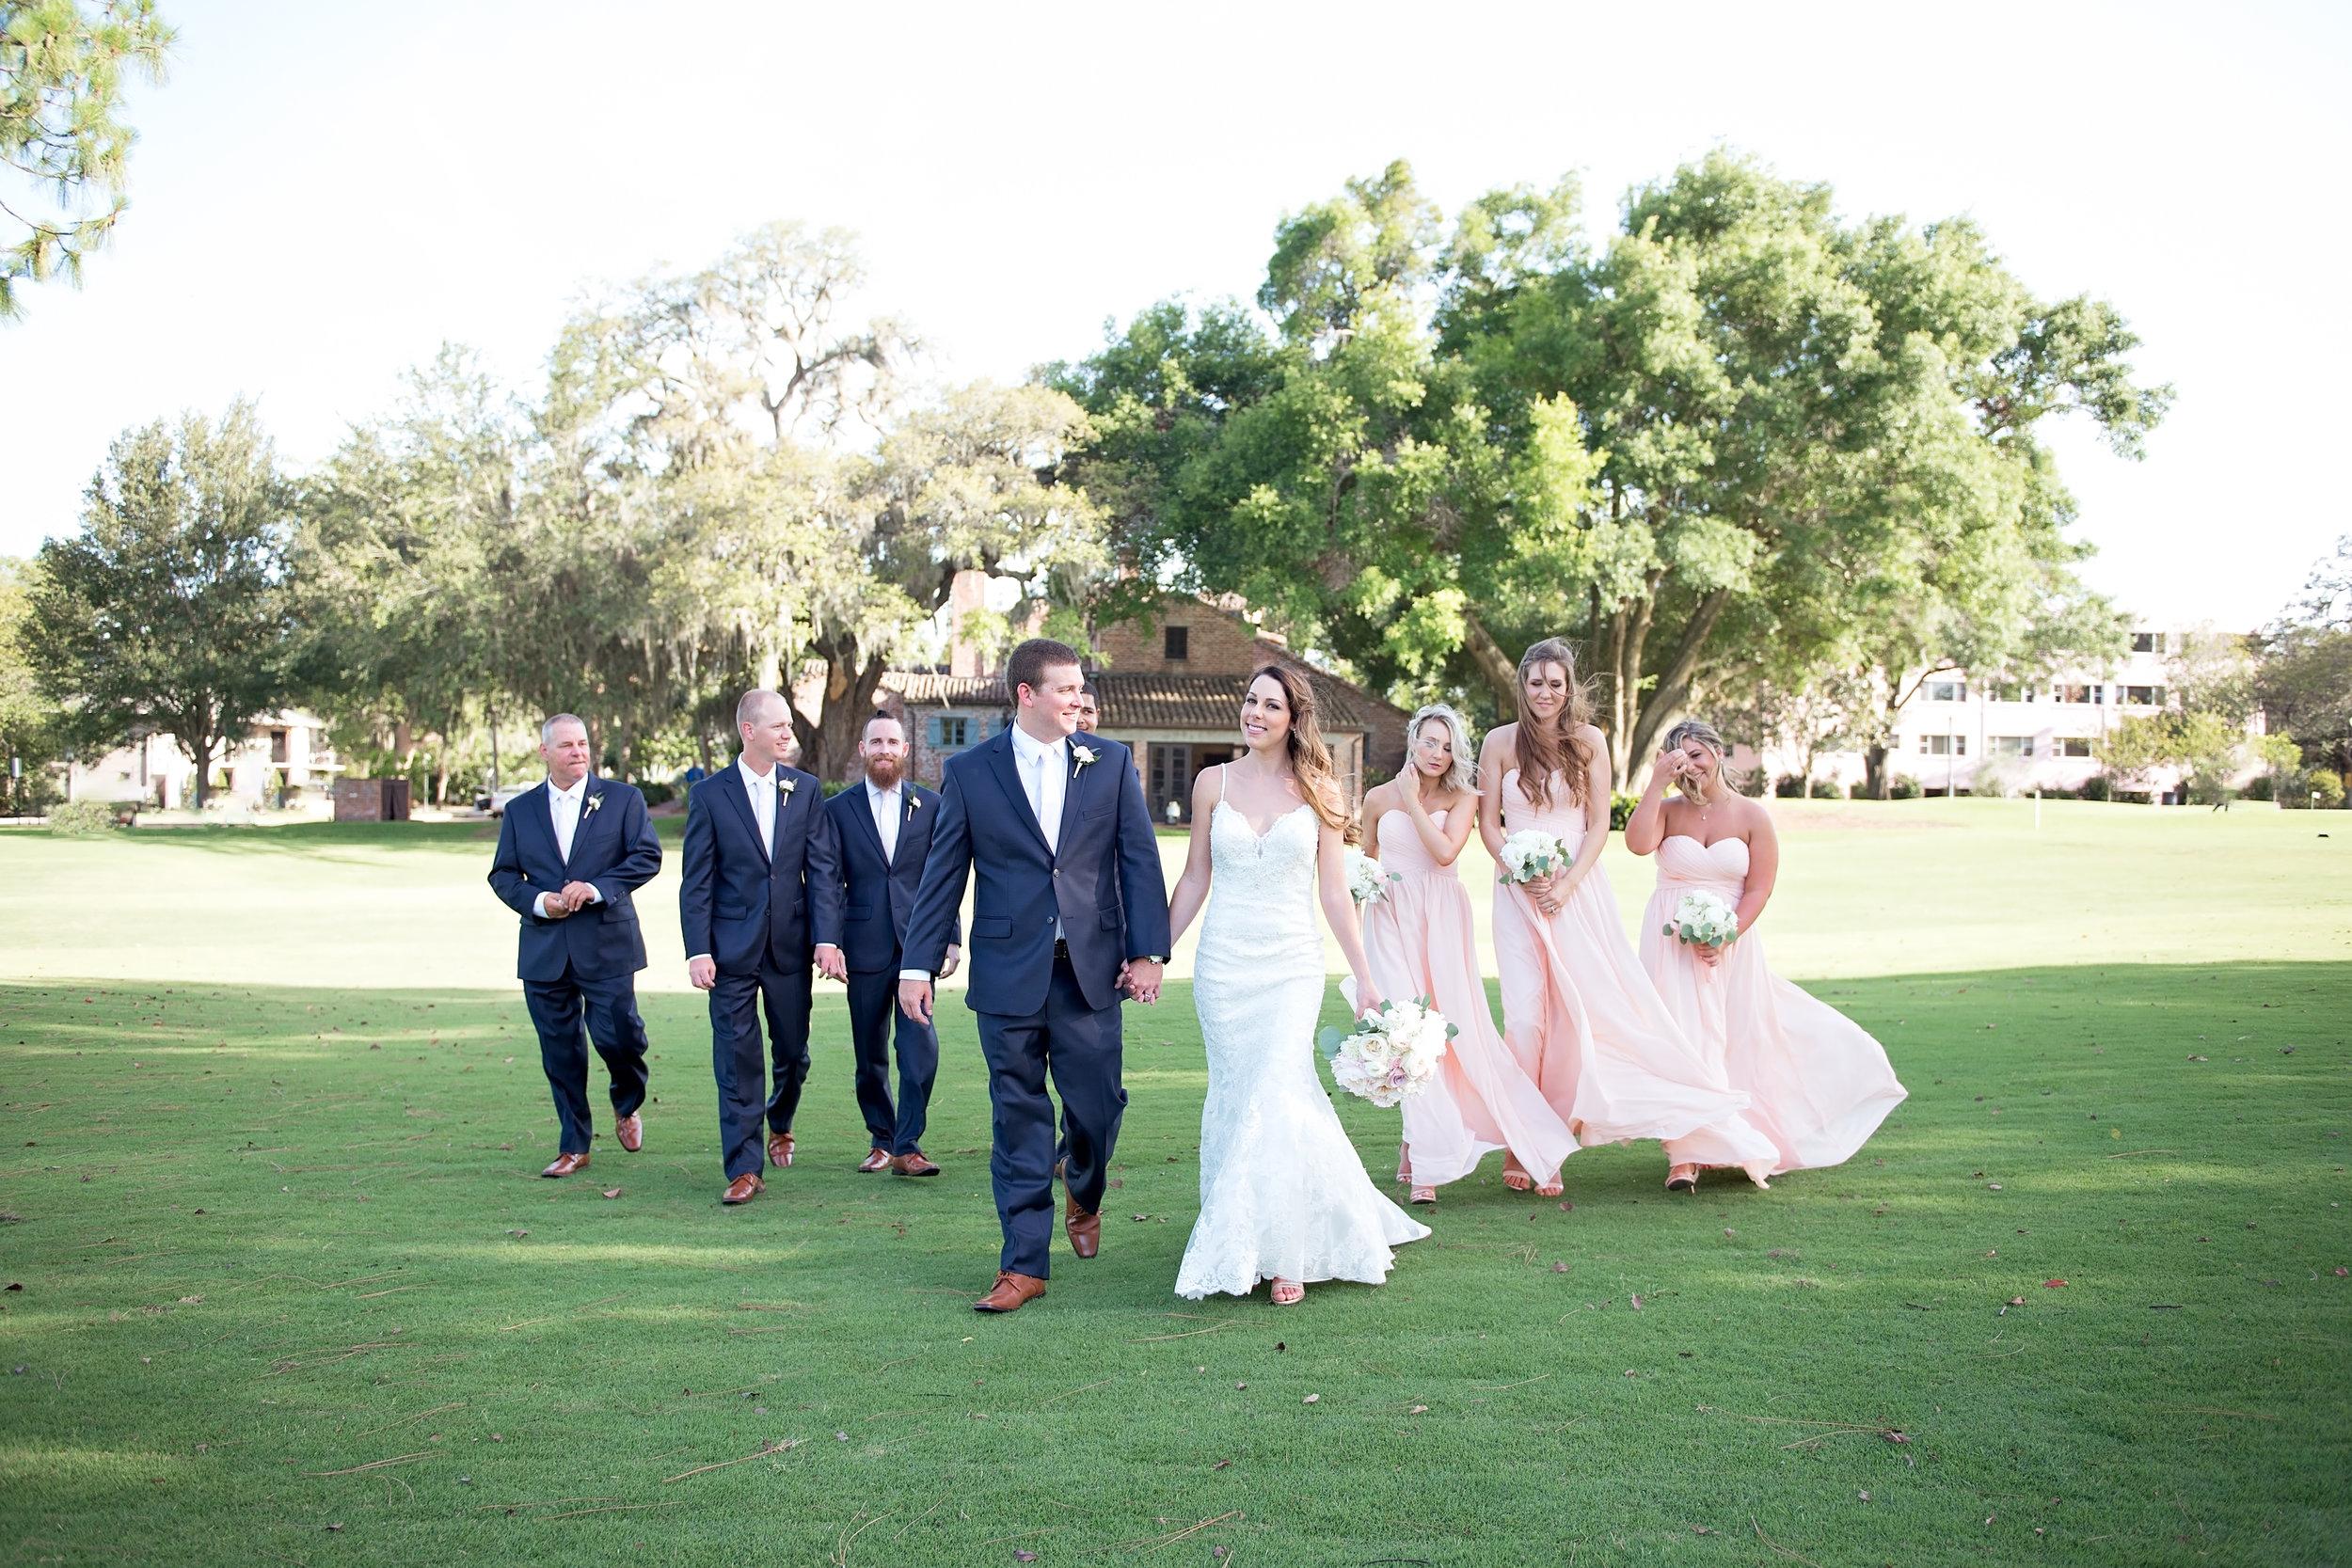 Blush Bridesmaid Dresses - Blush and White Wedding - Los Feliz Wedding